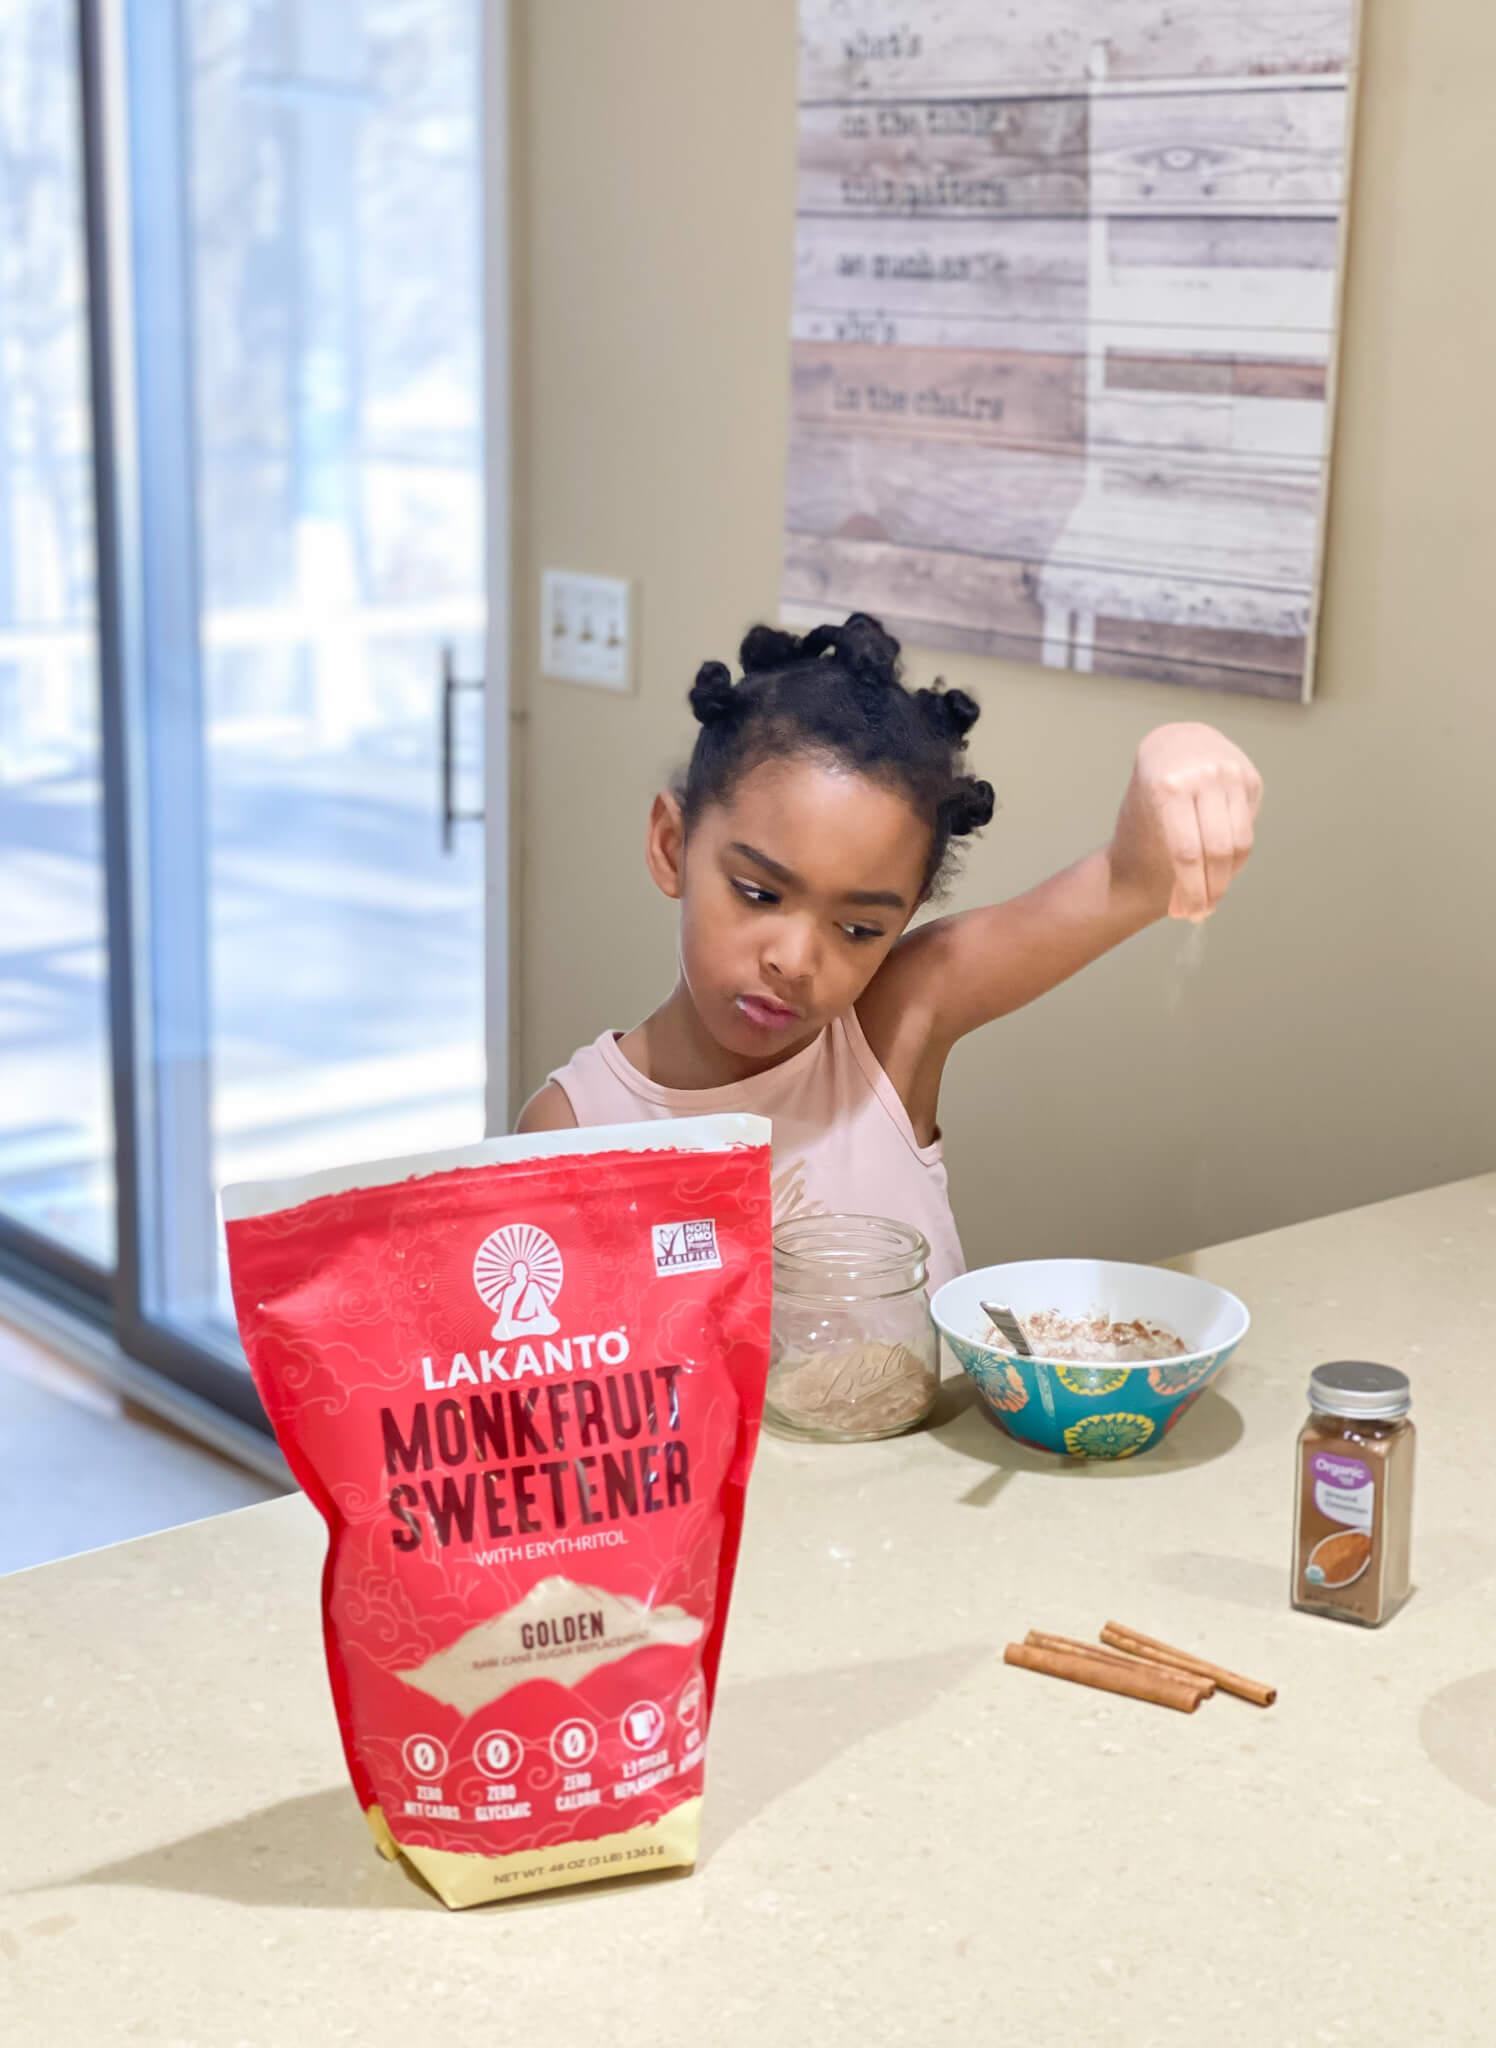 2-Ingredient No Sugar Cinnamon Sugar agutsygirl.com #nosugar #monkfruit #healthyliving #guthealth #cinnamonsugar Samarah Lakanto